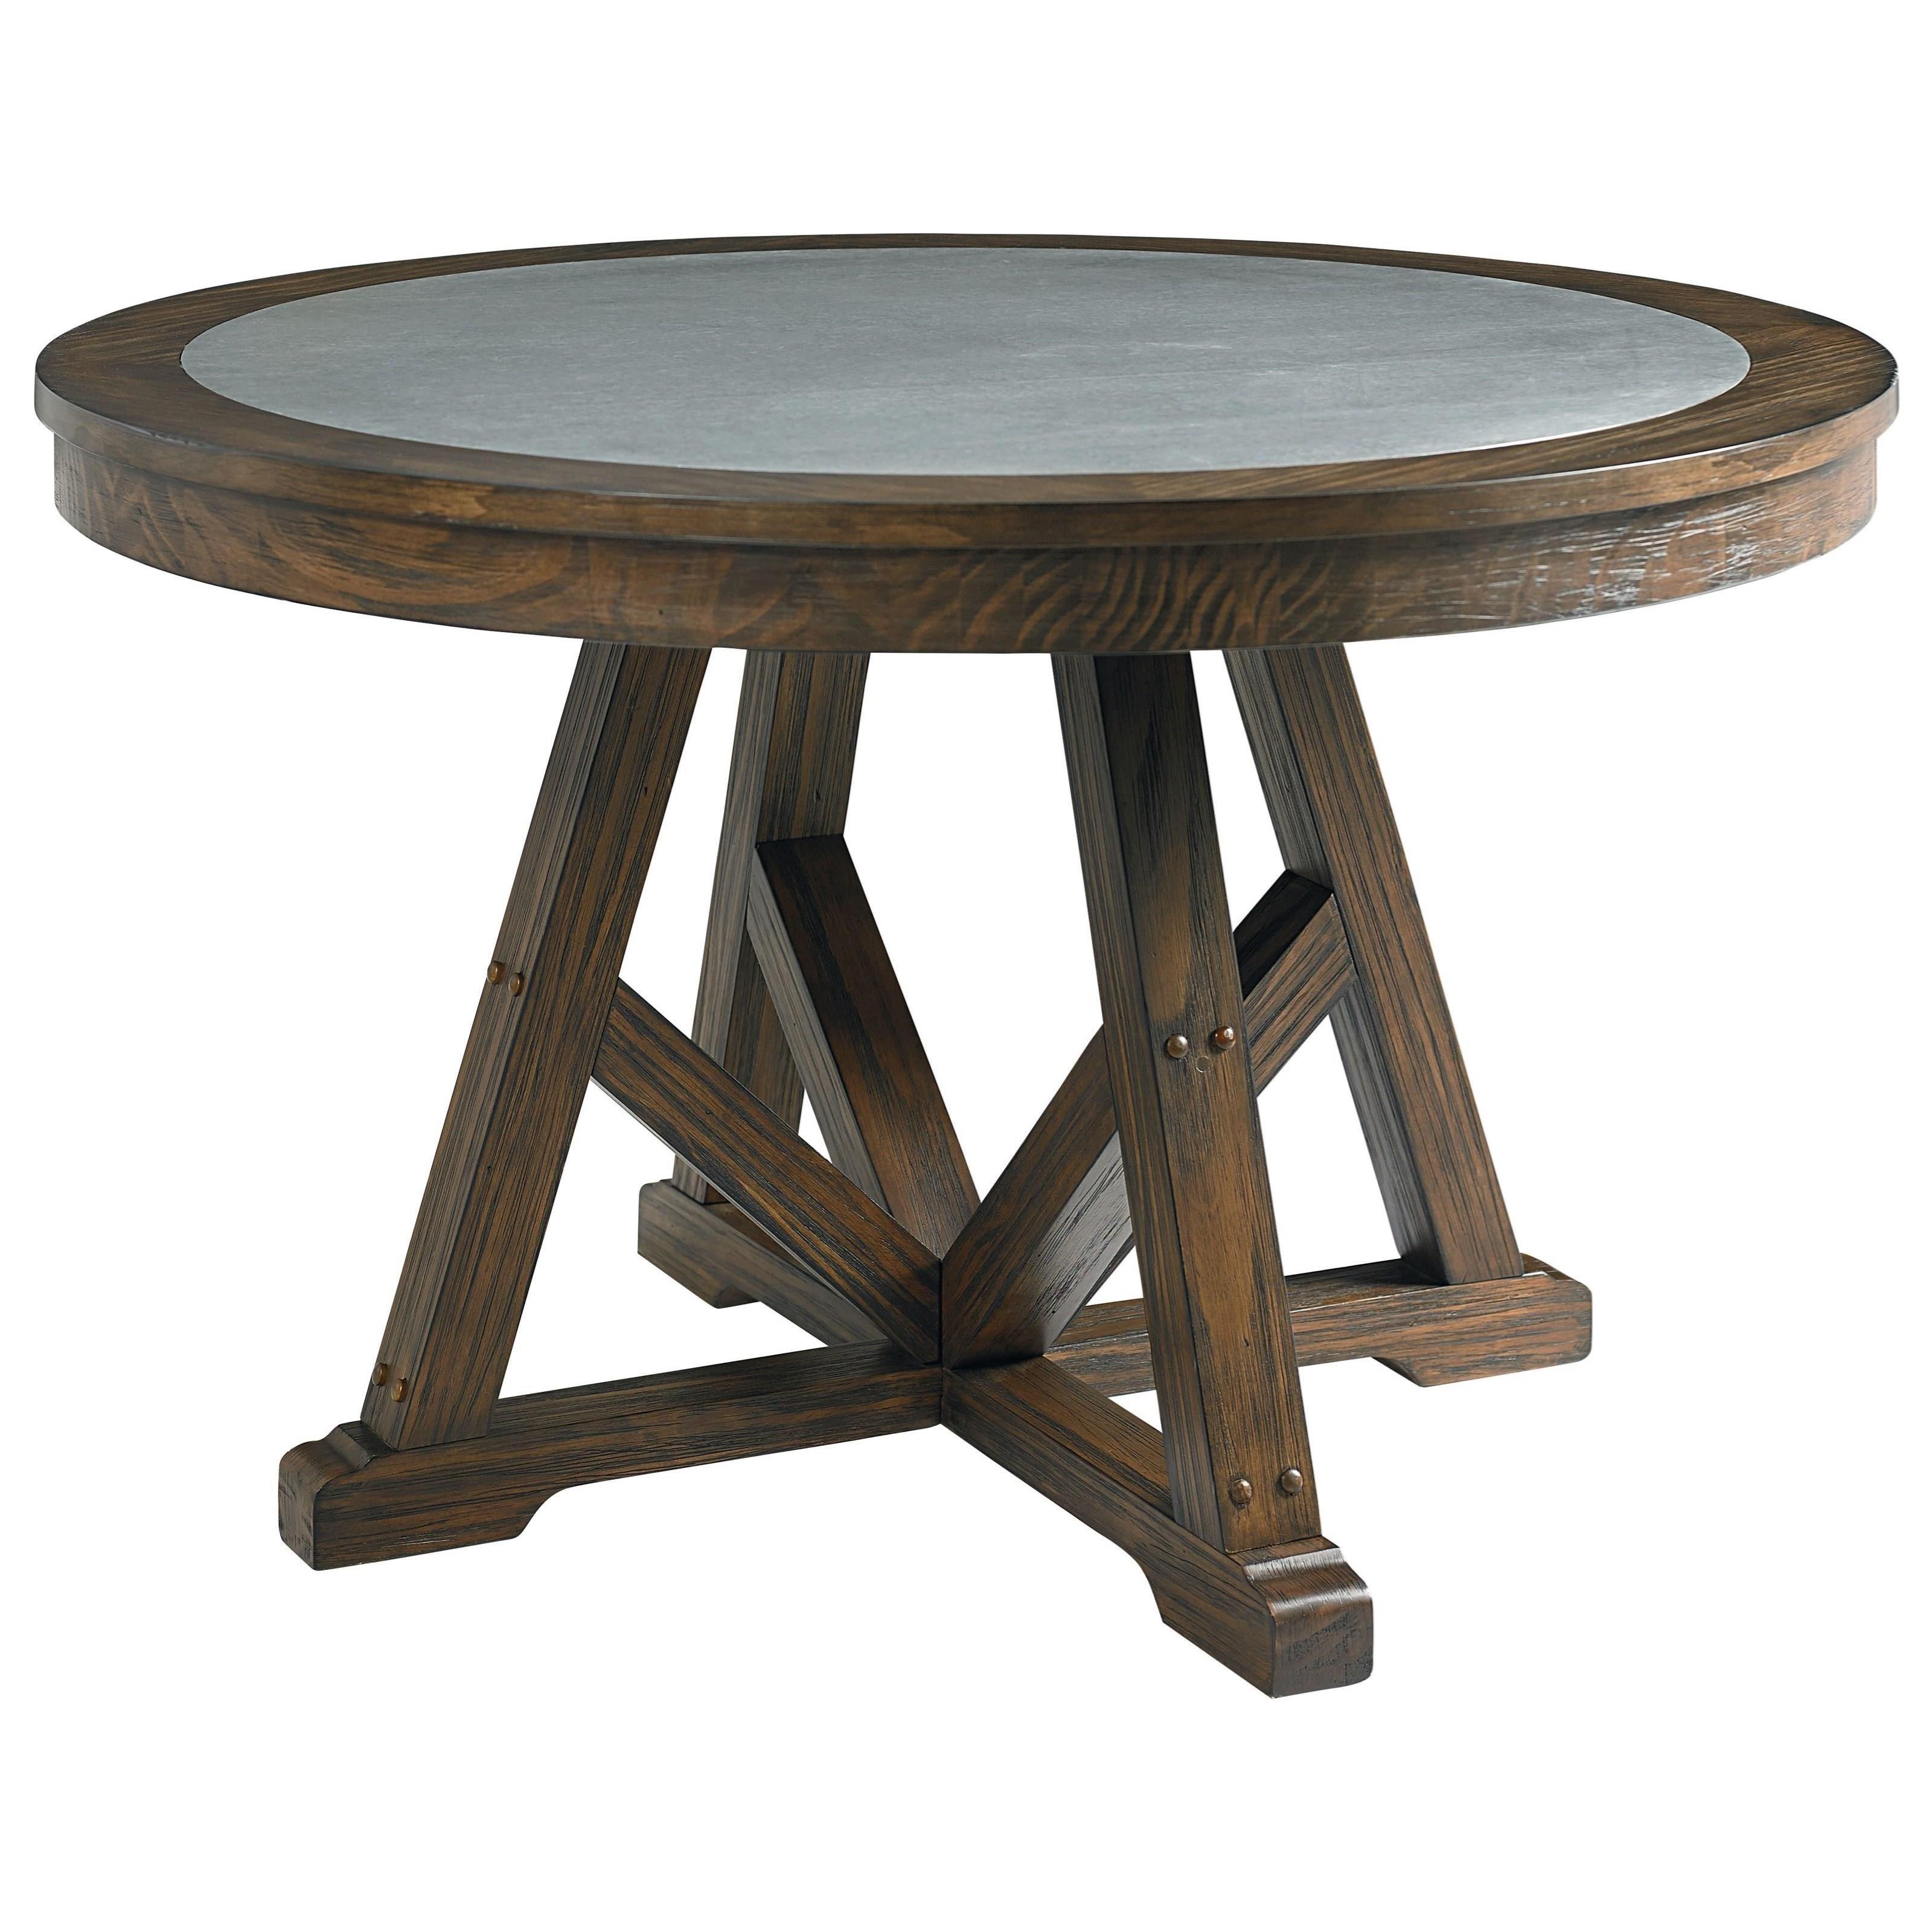 Standard Furniture Carter Round Dining Table   Item Number: 10881